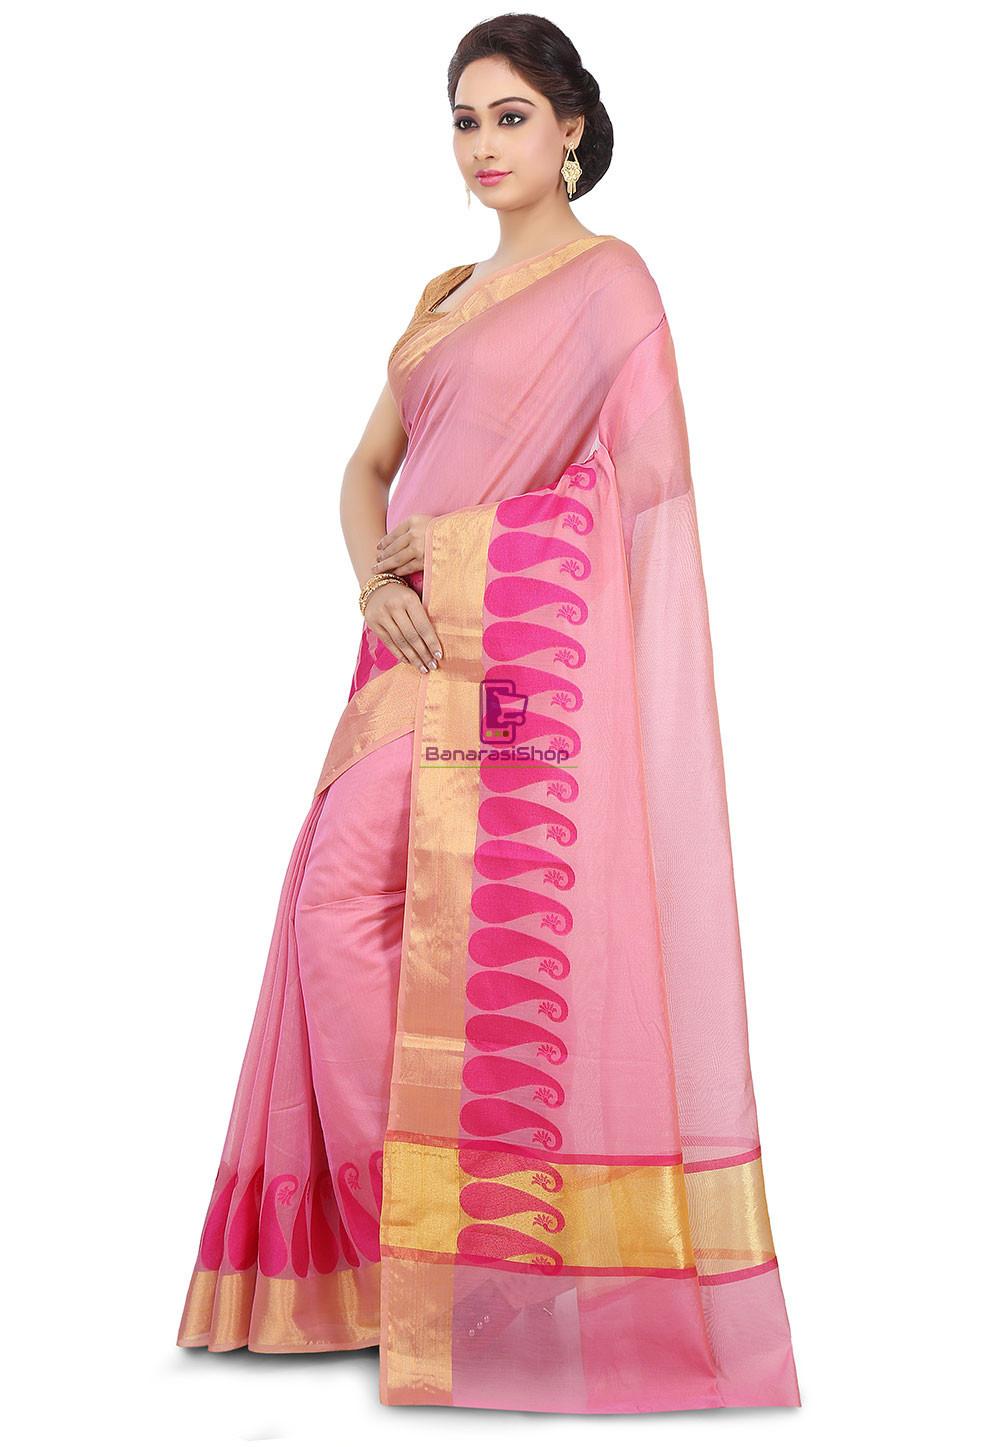 Woven Banarasi Chanderi Cotton Saree in Pink 5